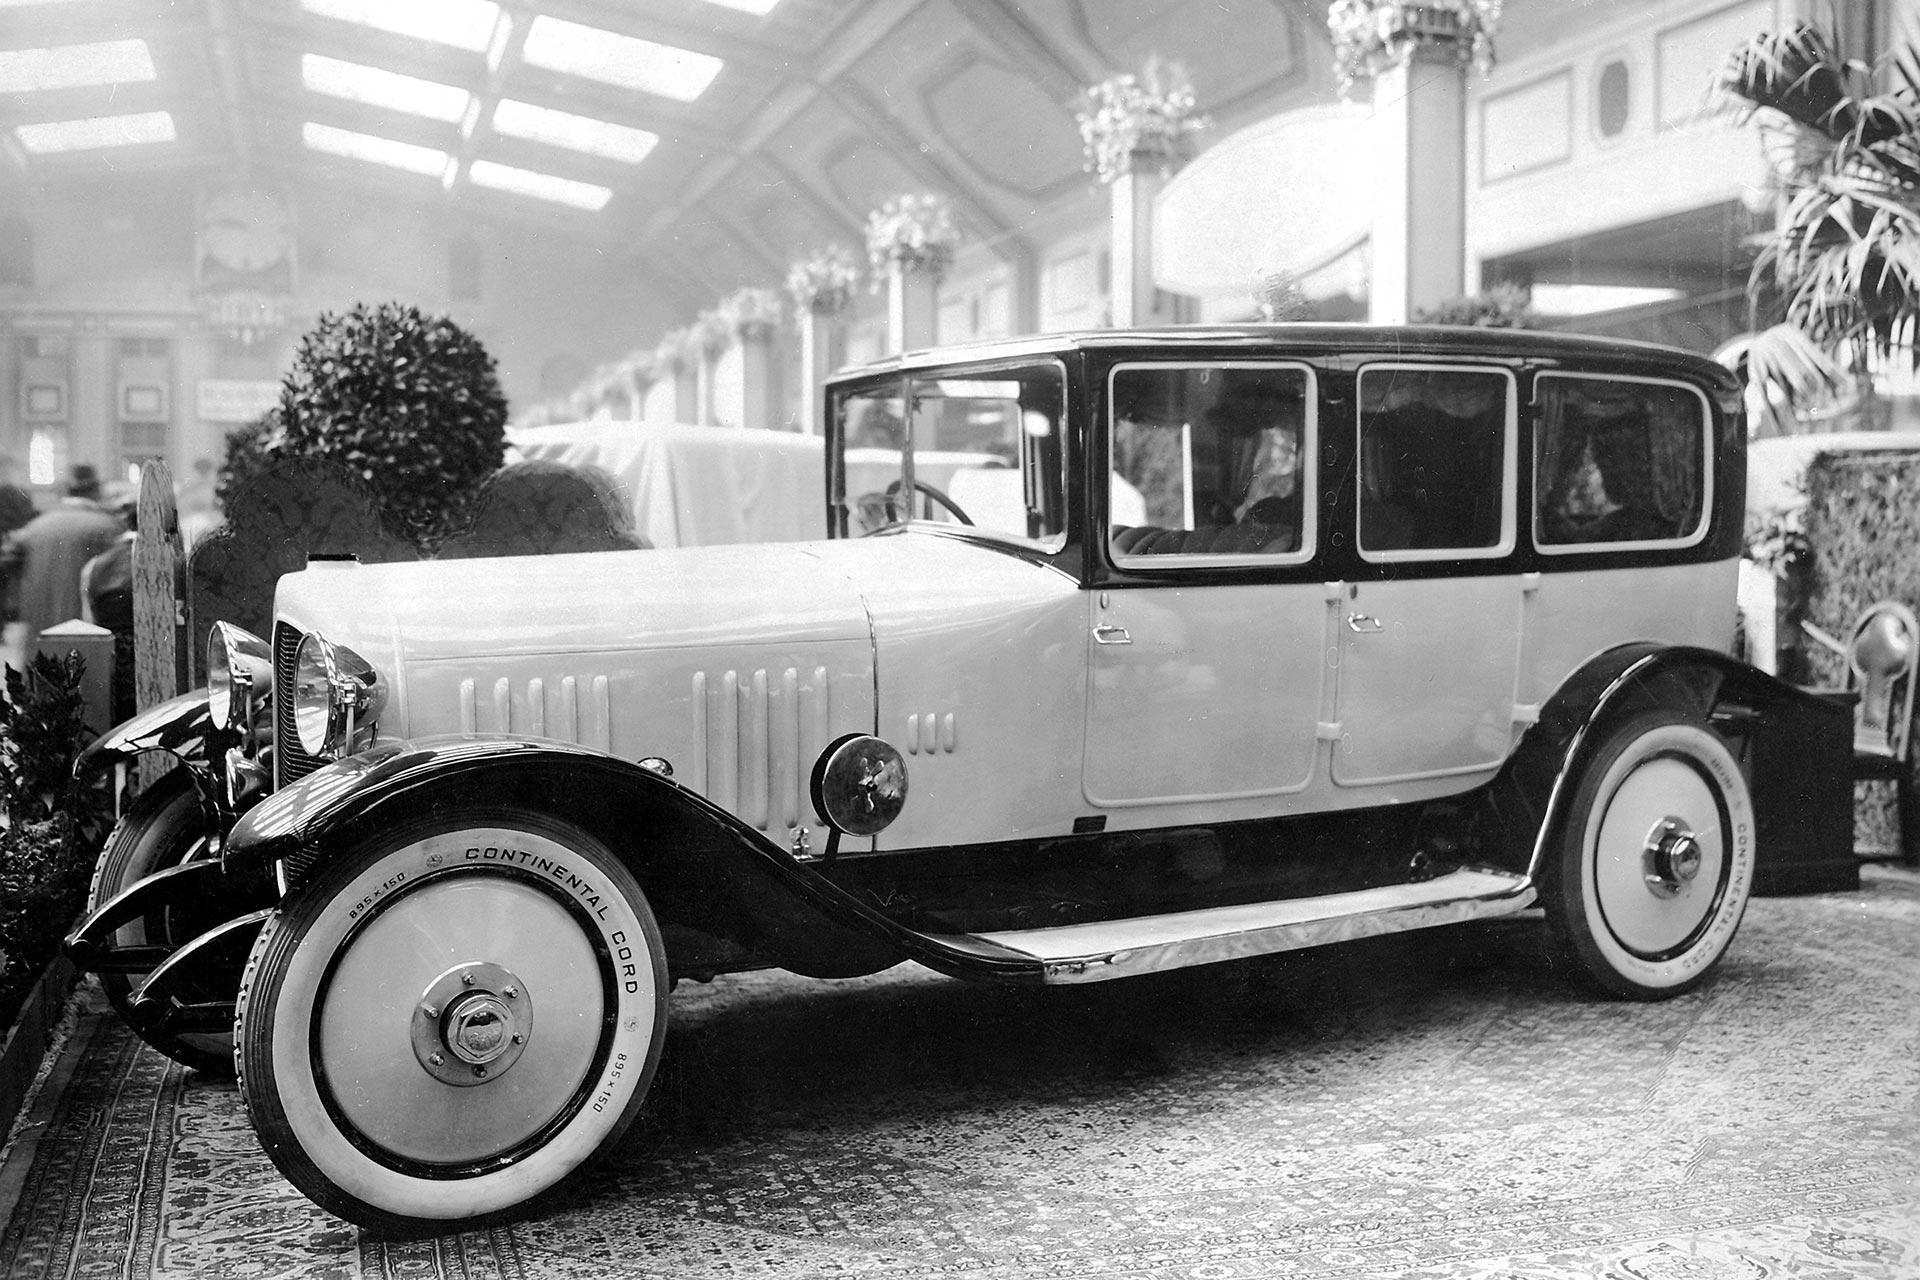 100 Jahre Maybach Automobile 1921-2021; Maybach 22/70 PS W 3